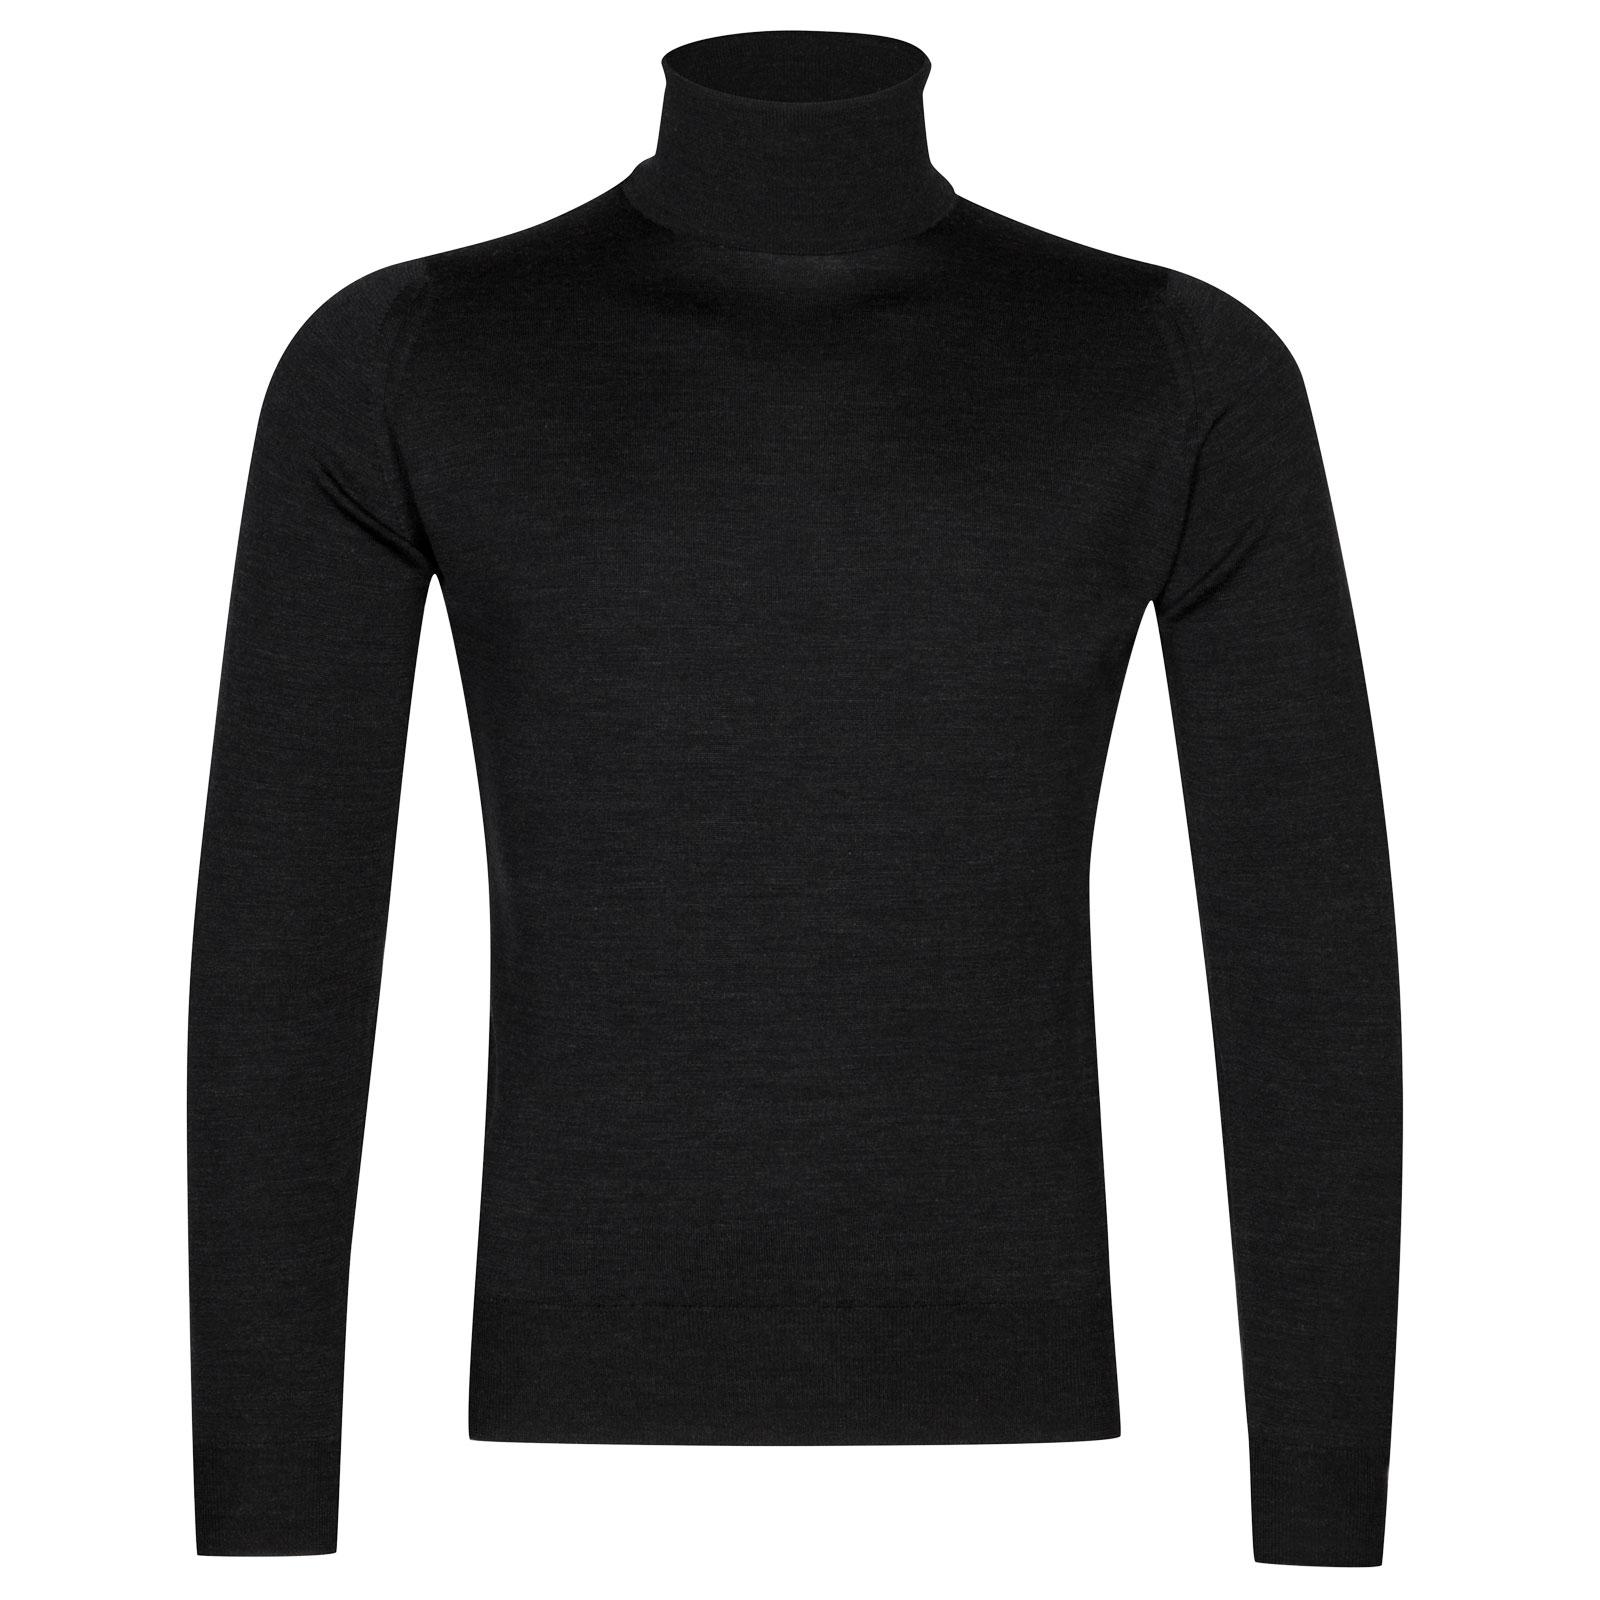 John Smedley Orta Merino Wool Pullover in Hepburn Smoke-XL